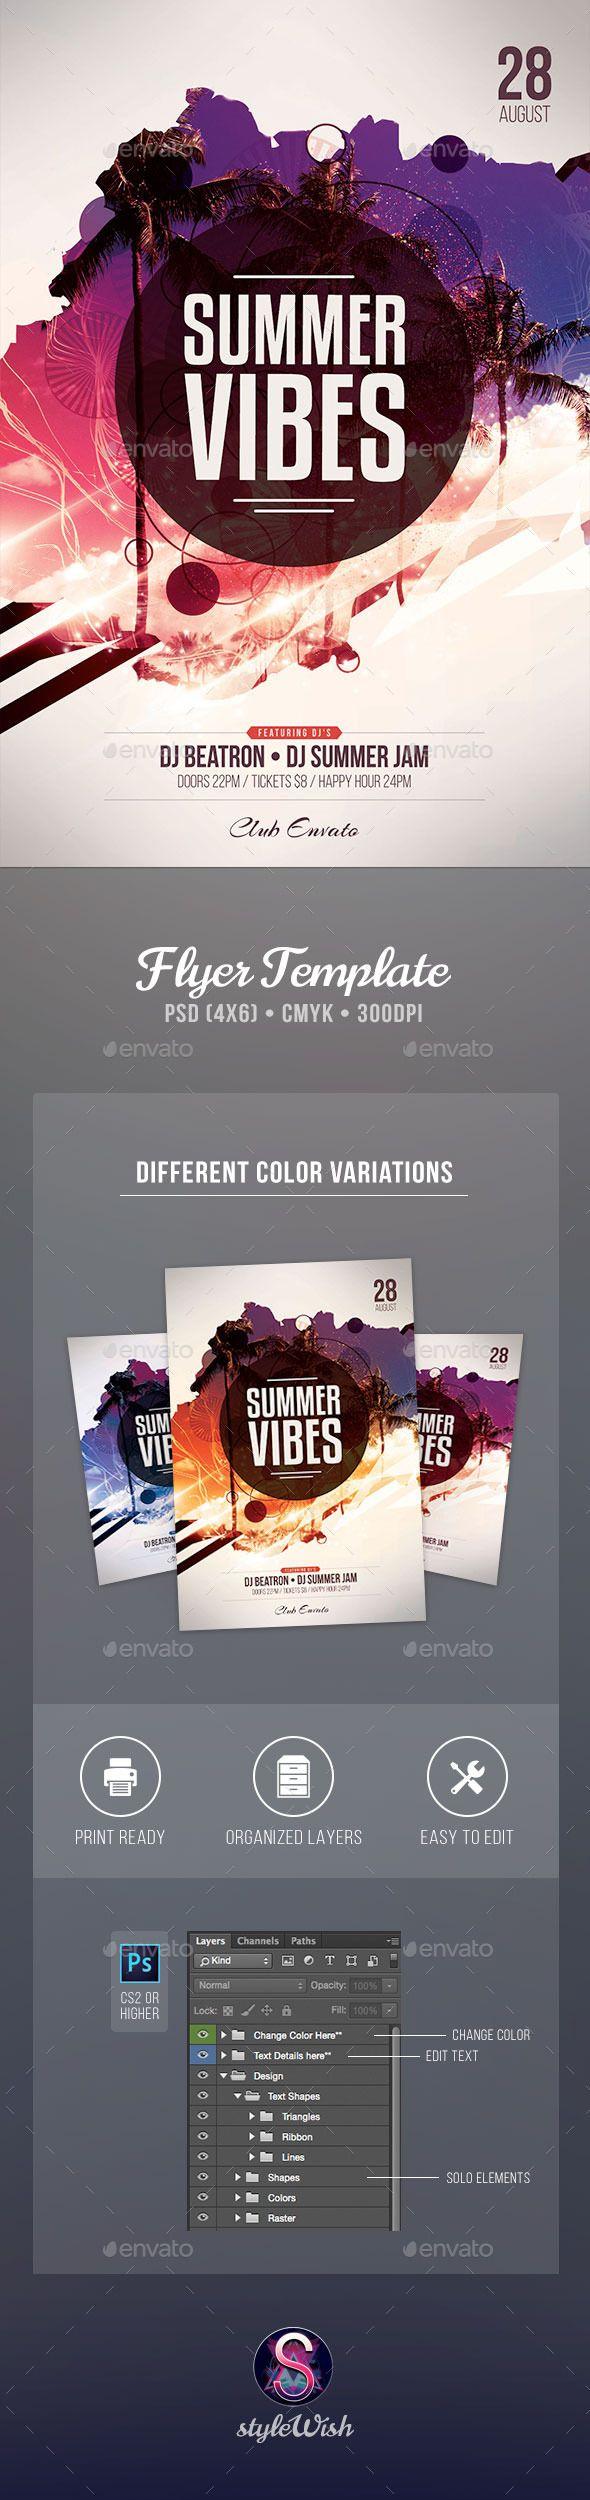 Summer Vibes Flyer Template #design Download: http://graphicriver.net/item/summer-vibes-flyer/12371131?ref=ksioks